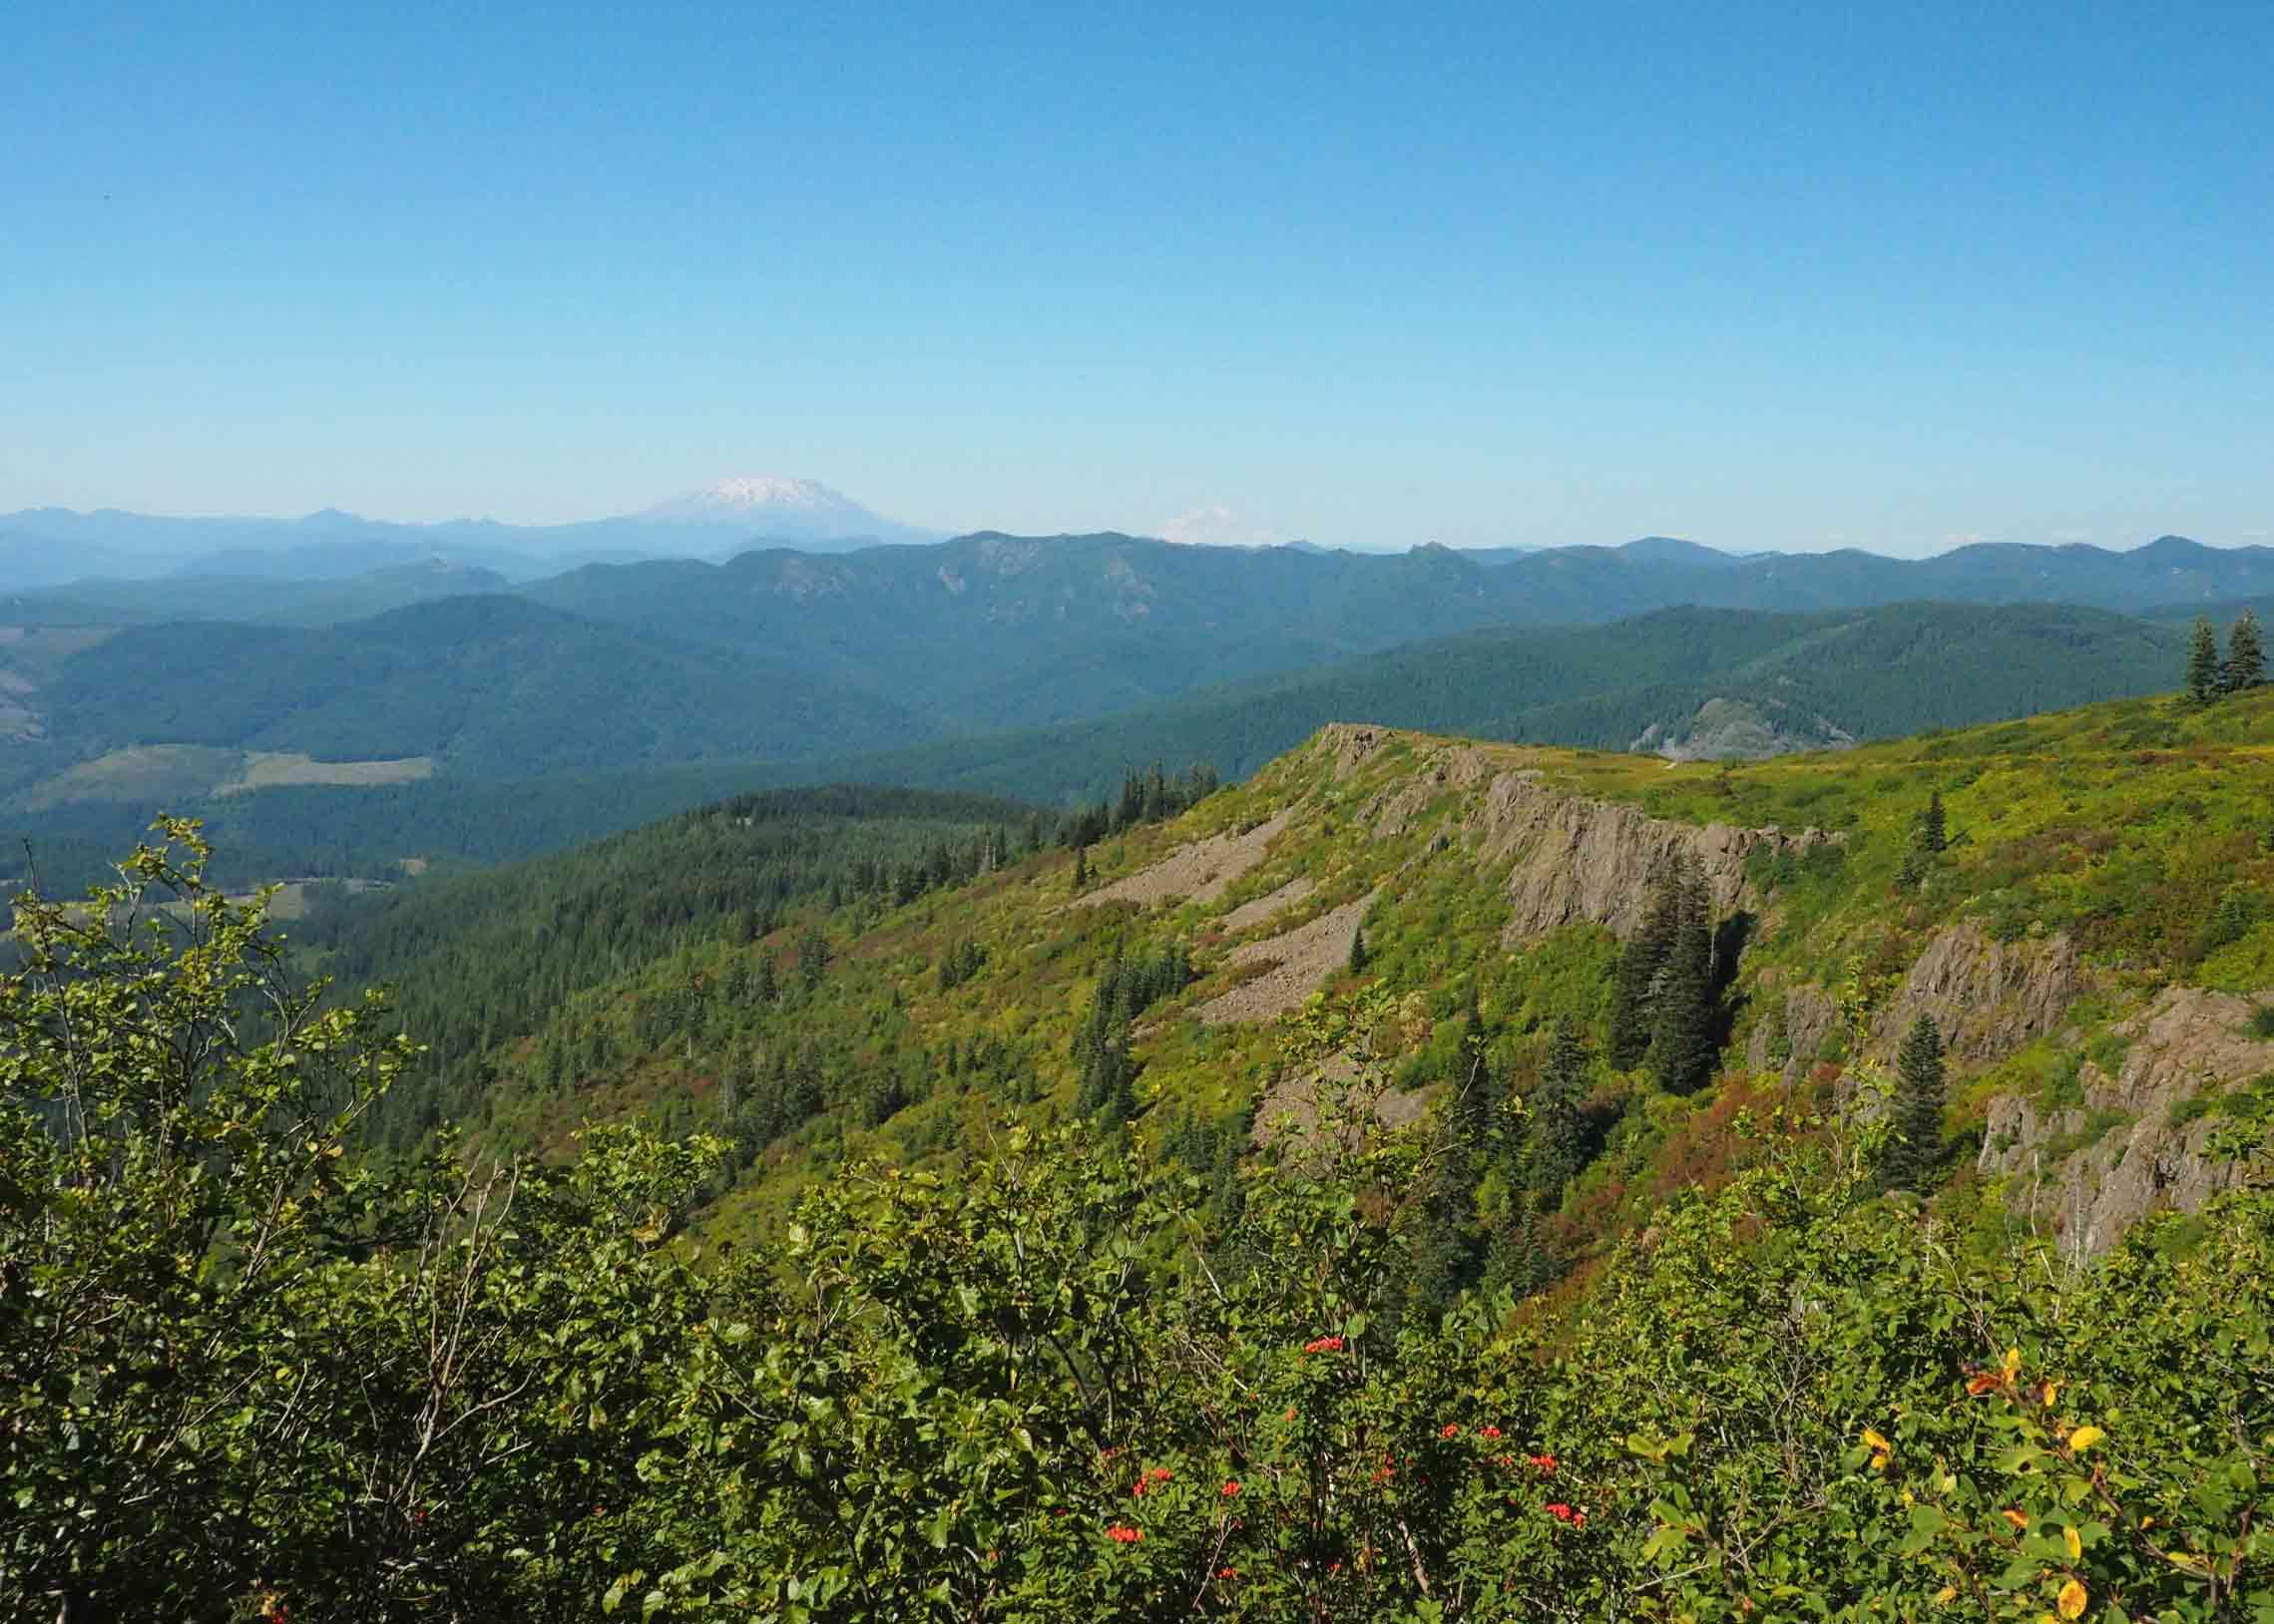 Chinook Trail